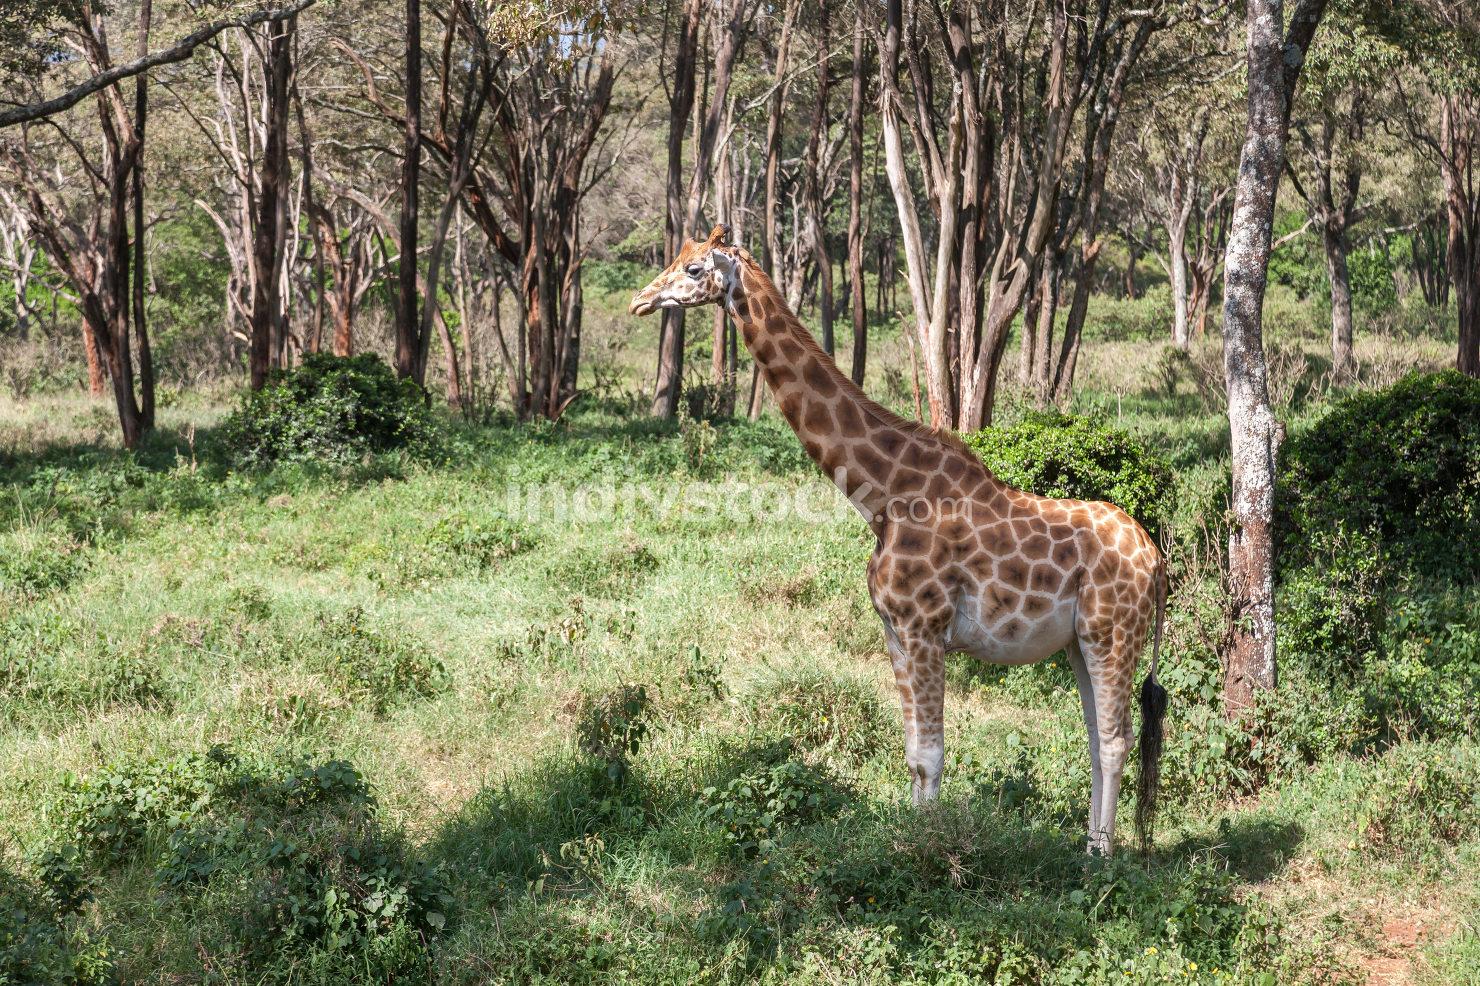 A pregnant giraffe stands in the bushes